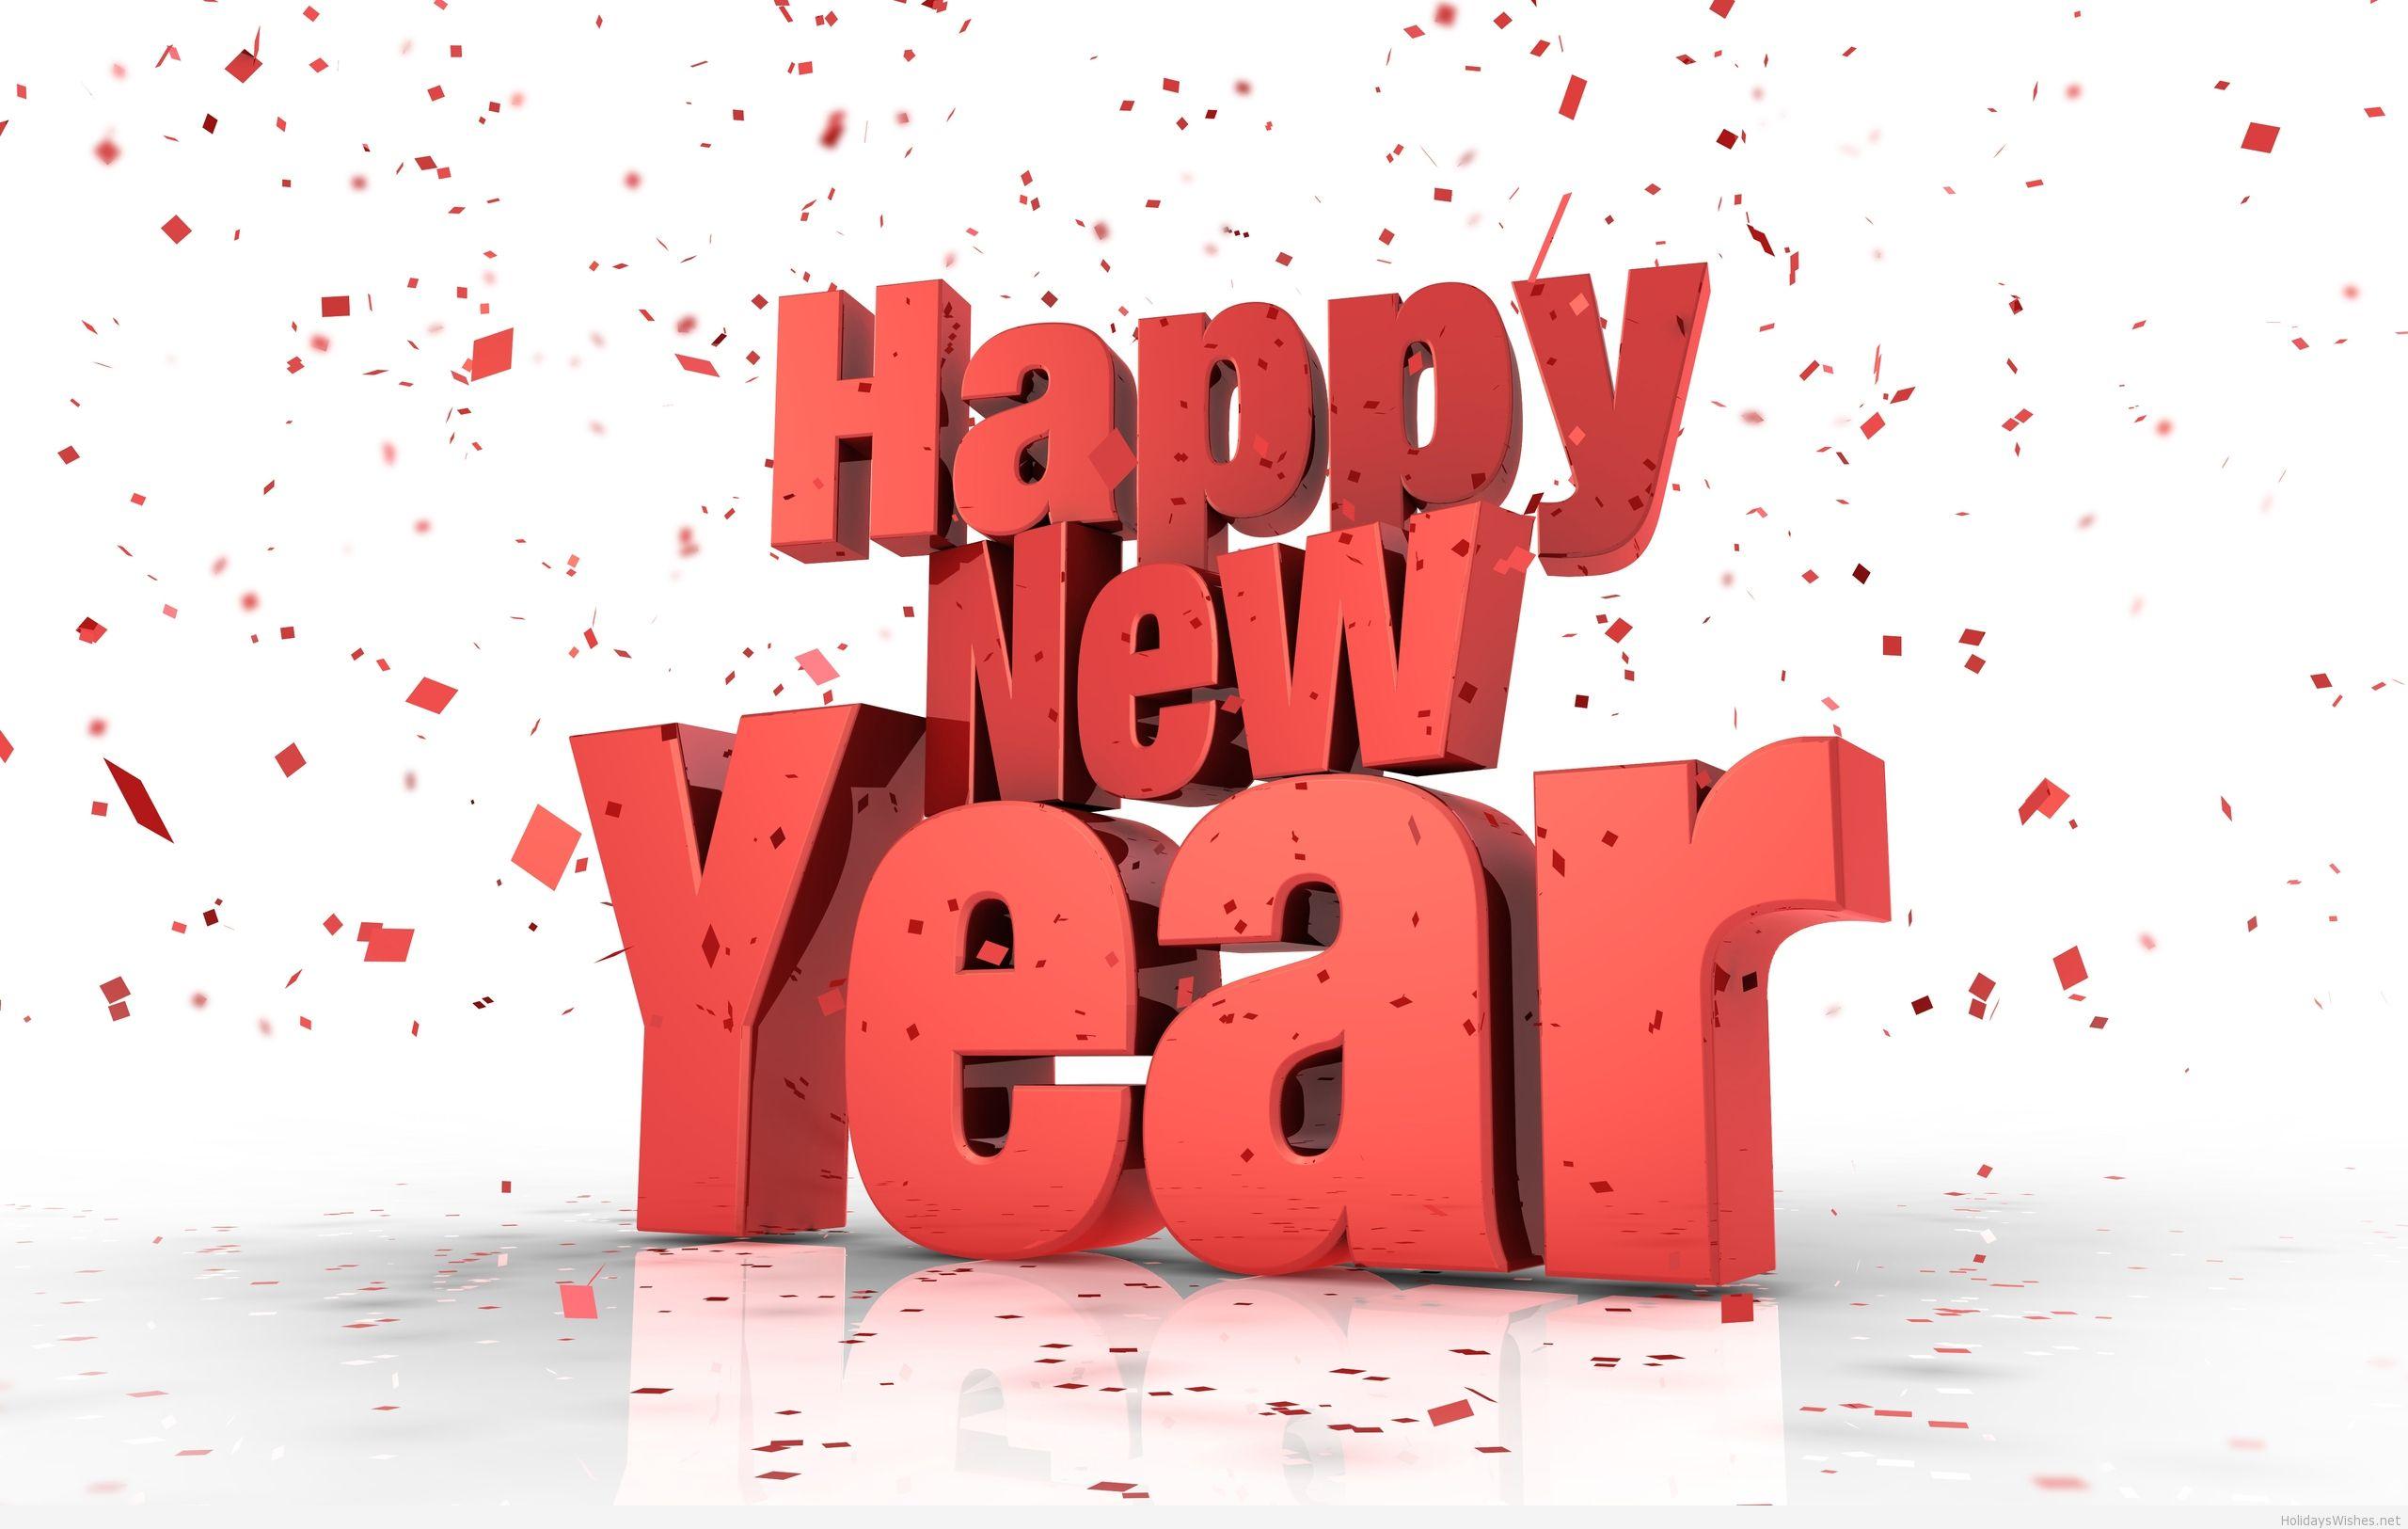 Happy New Year 2015 Wallpaper 2560x1625